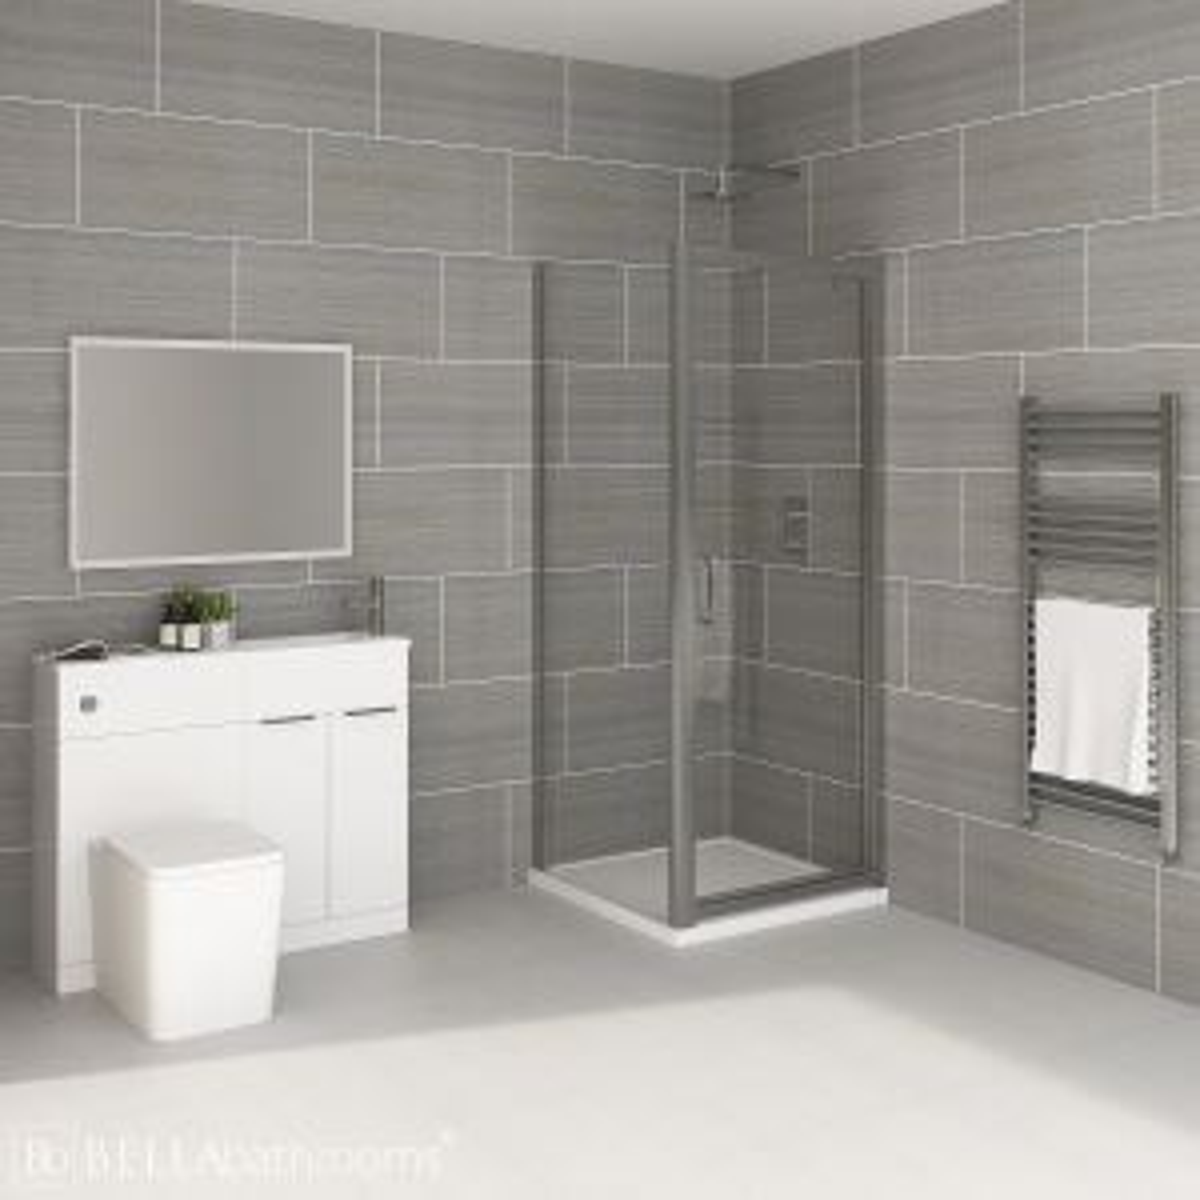 Elation Combination White Furniture Suite with April Destini Pivot Shower Enclosure with Brearton Toilet